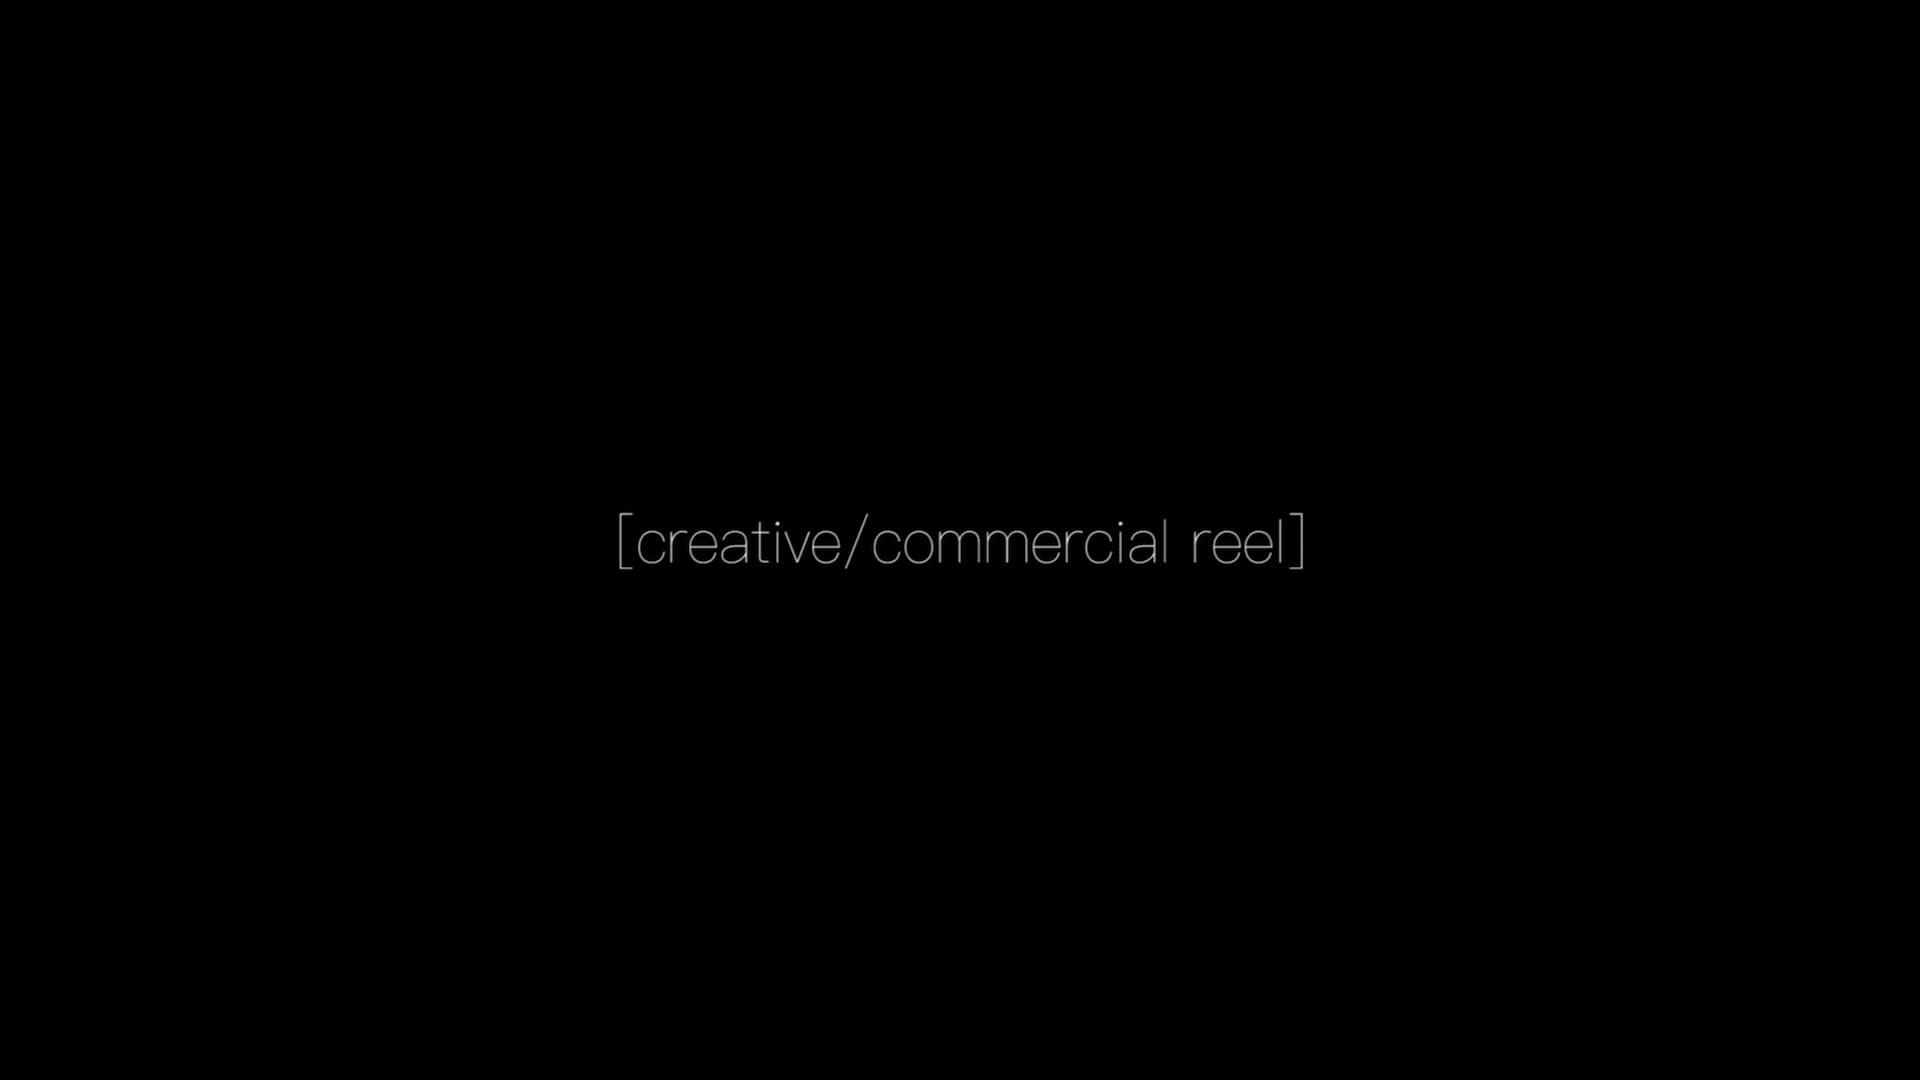 Philip Rabalais Reel [creative/commercial]